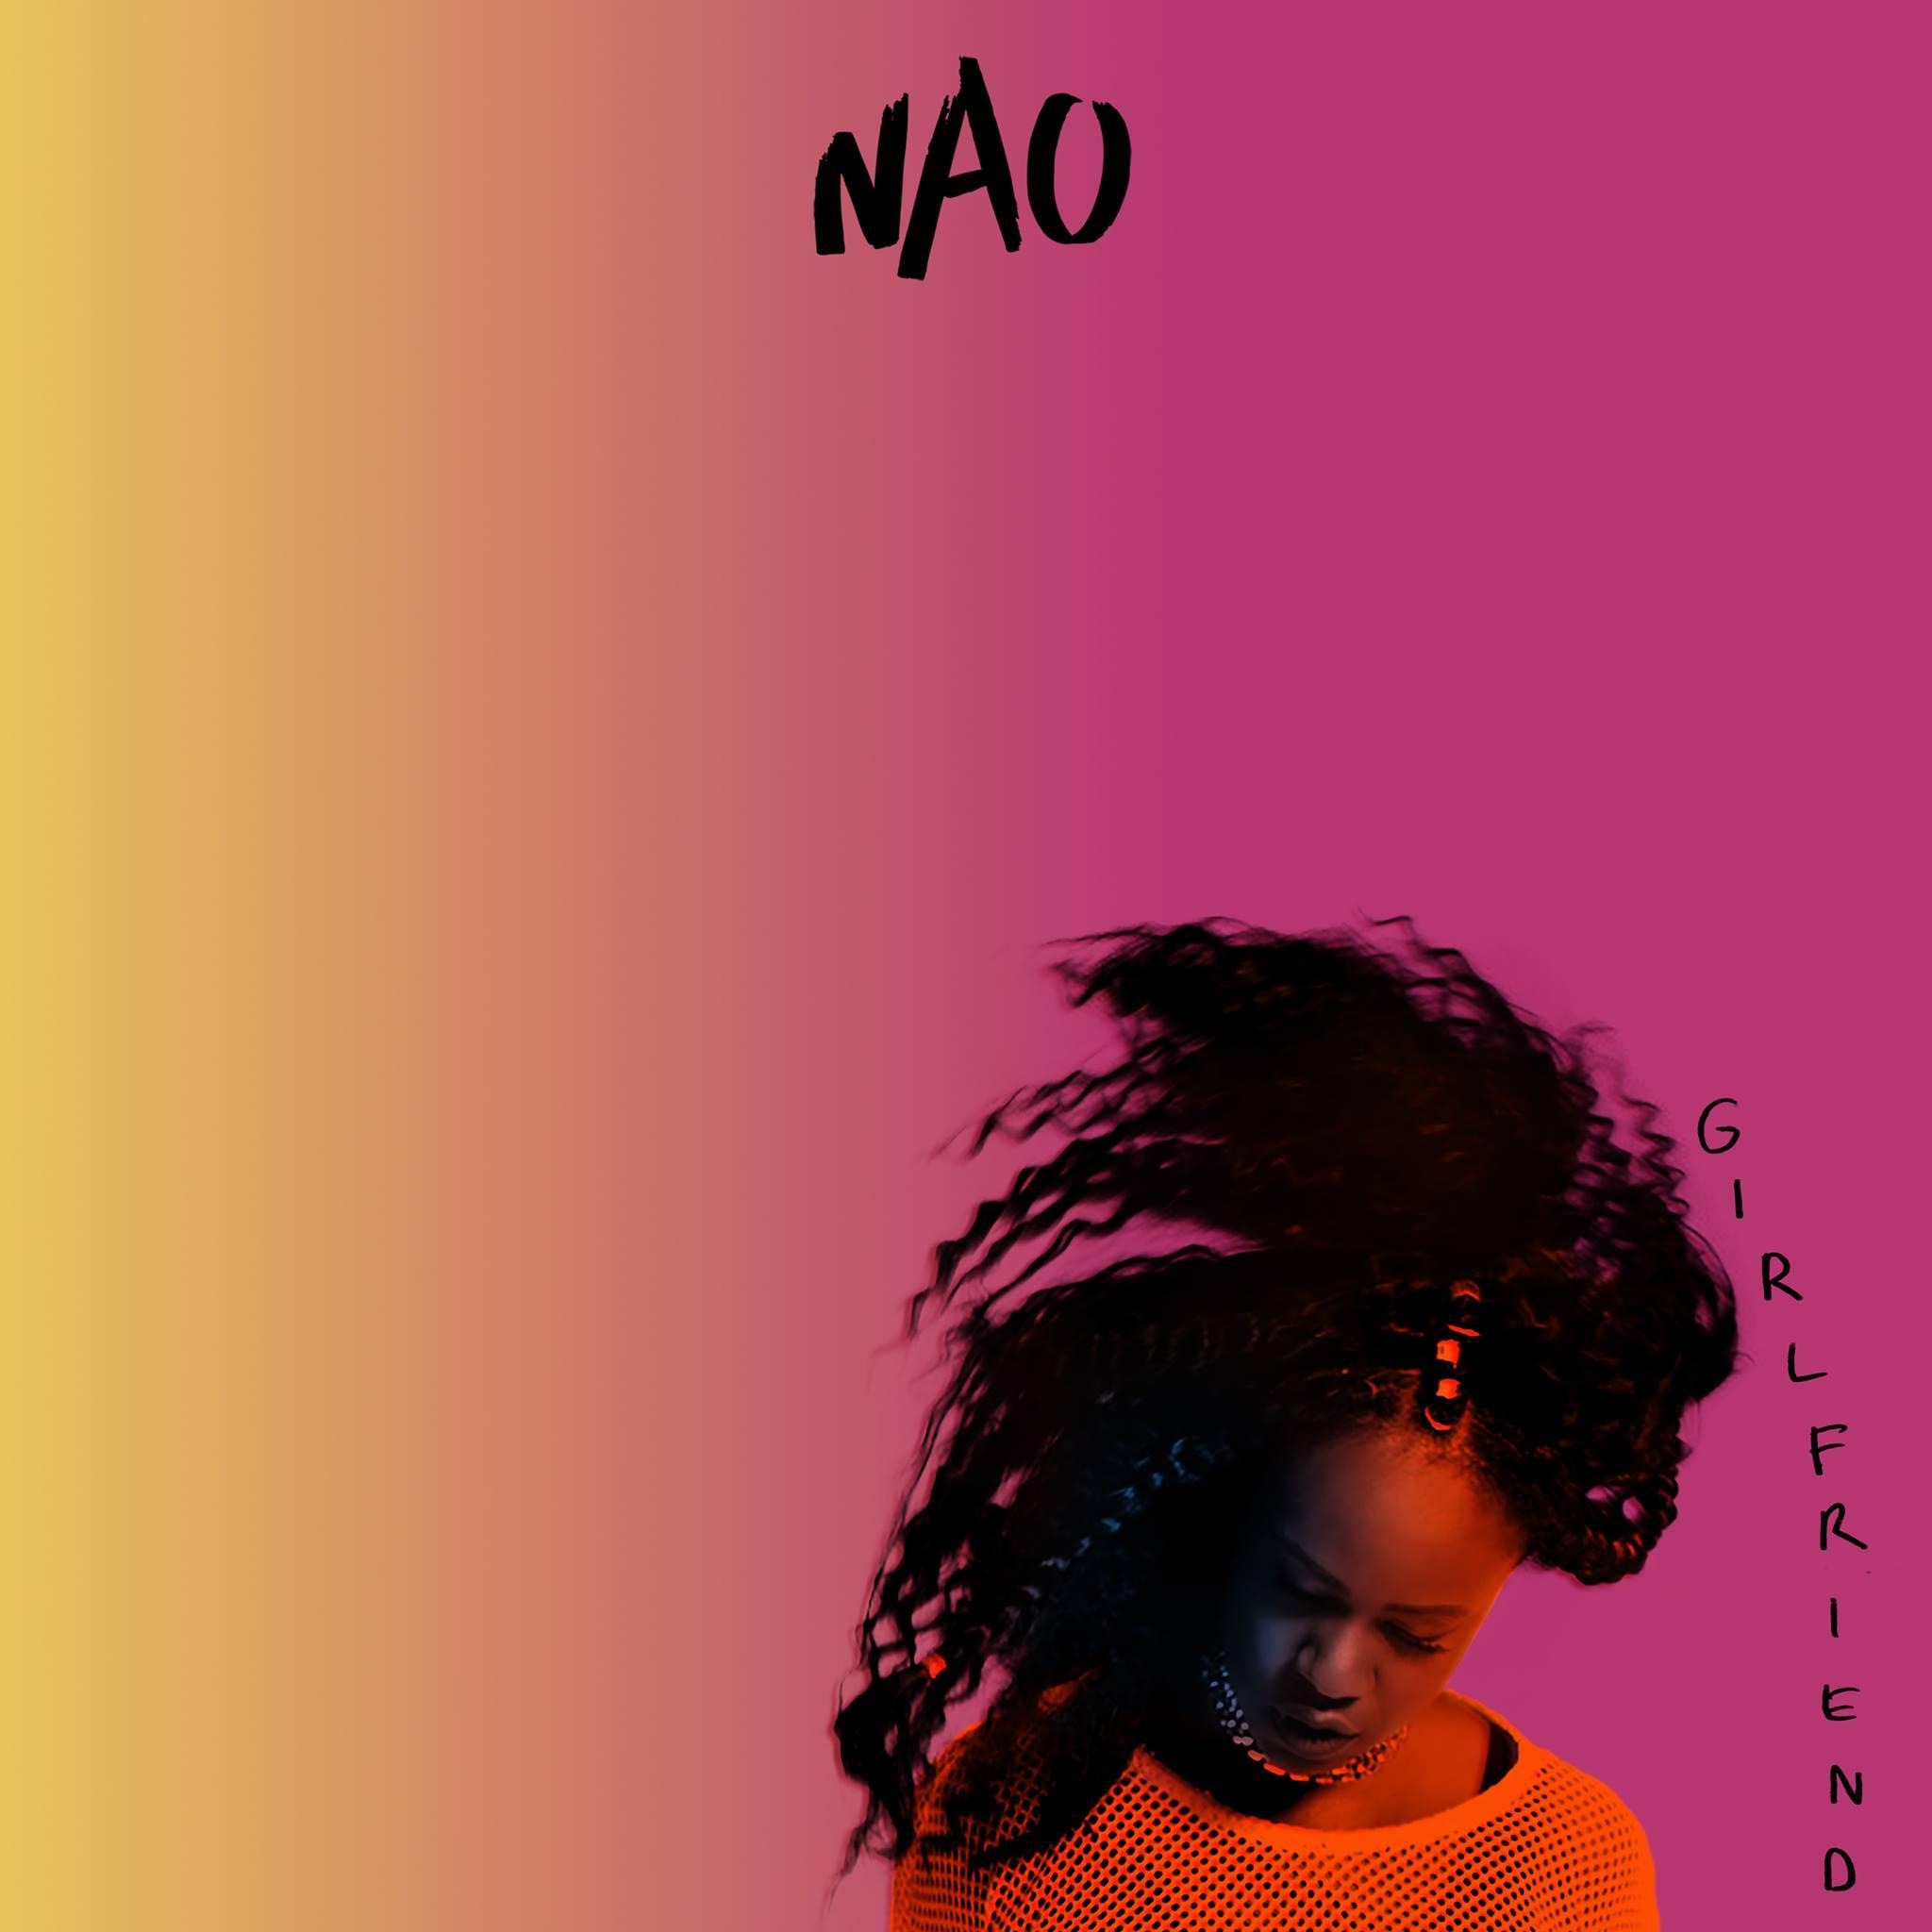 NAO 01.08.2016ANDREW